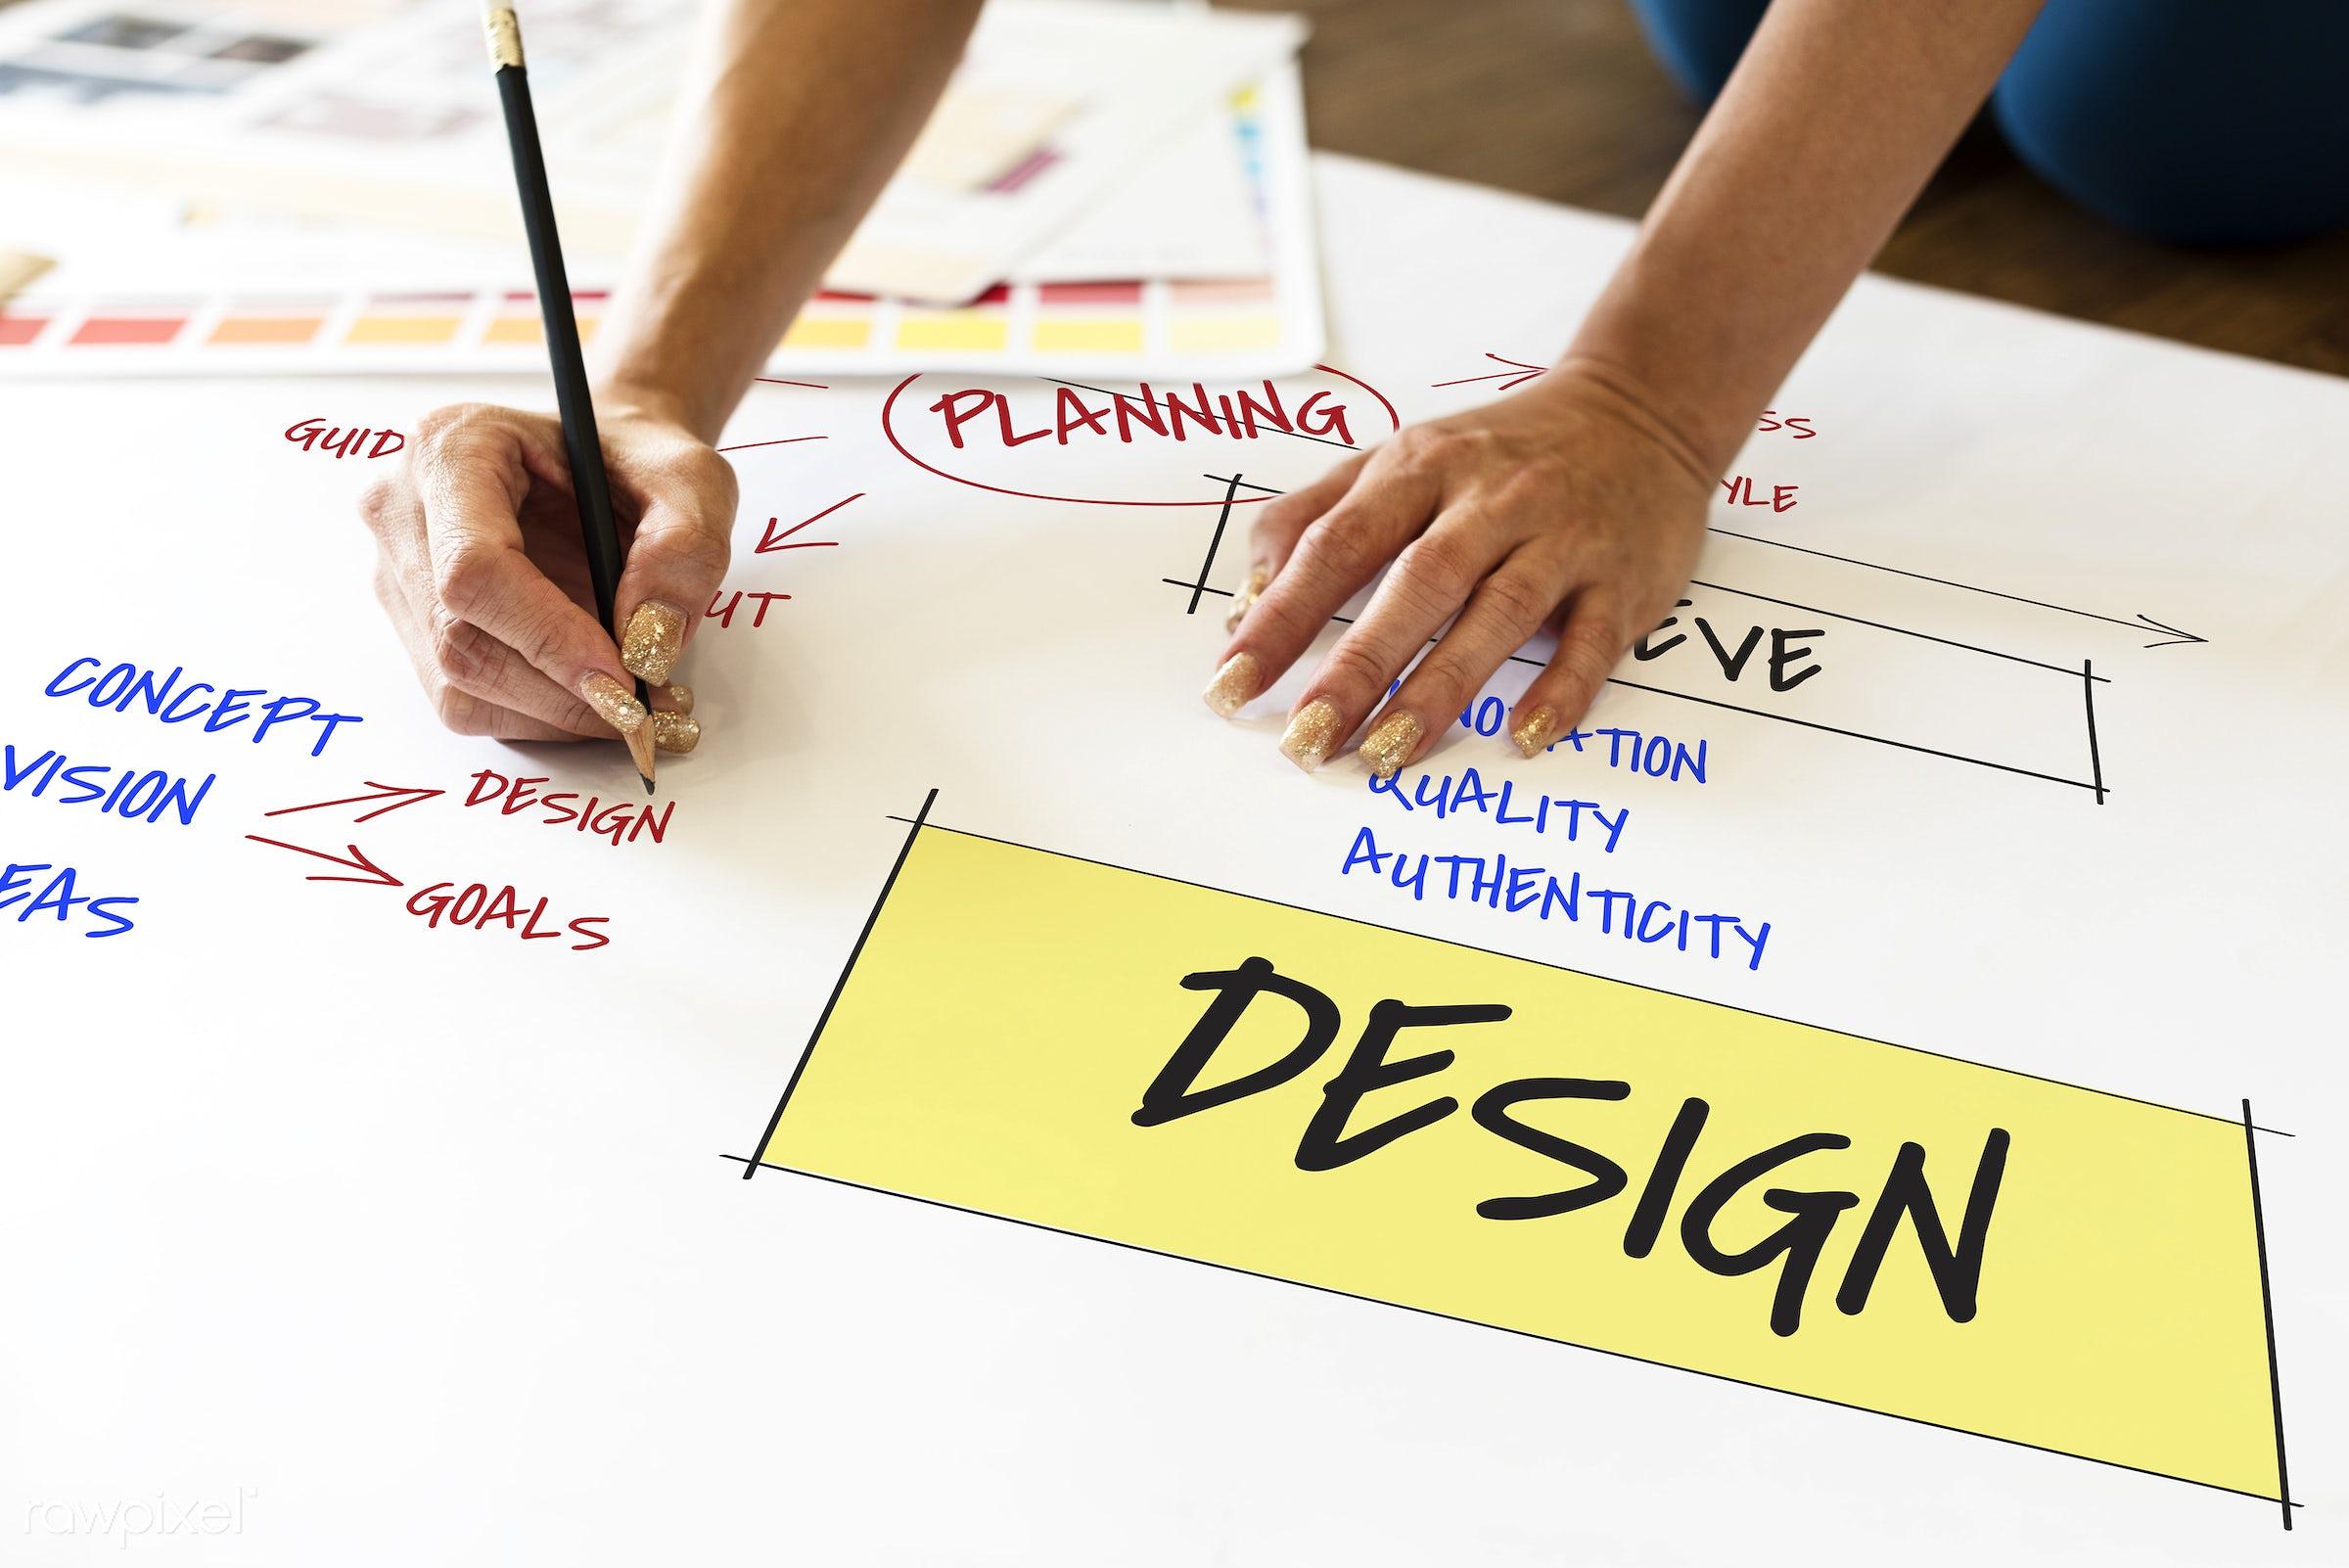 Design - innovation, target, achieve, art, authenticity, coal, concept, creation, creative, creativity, design, draft,...